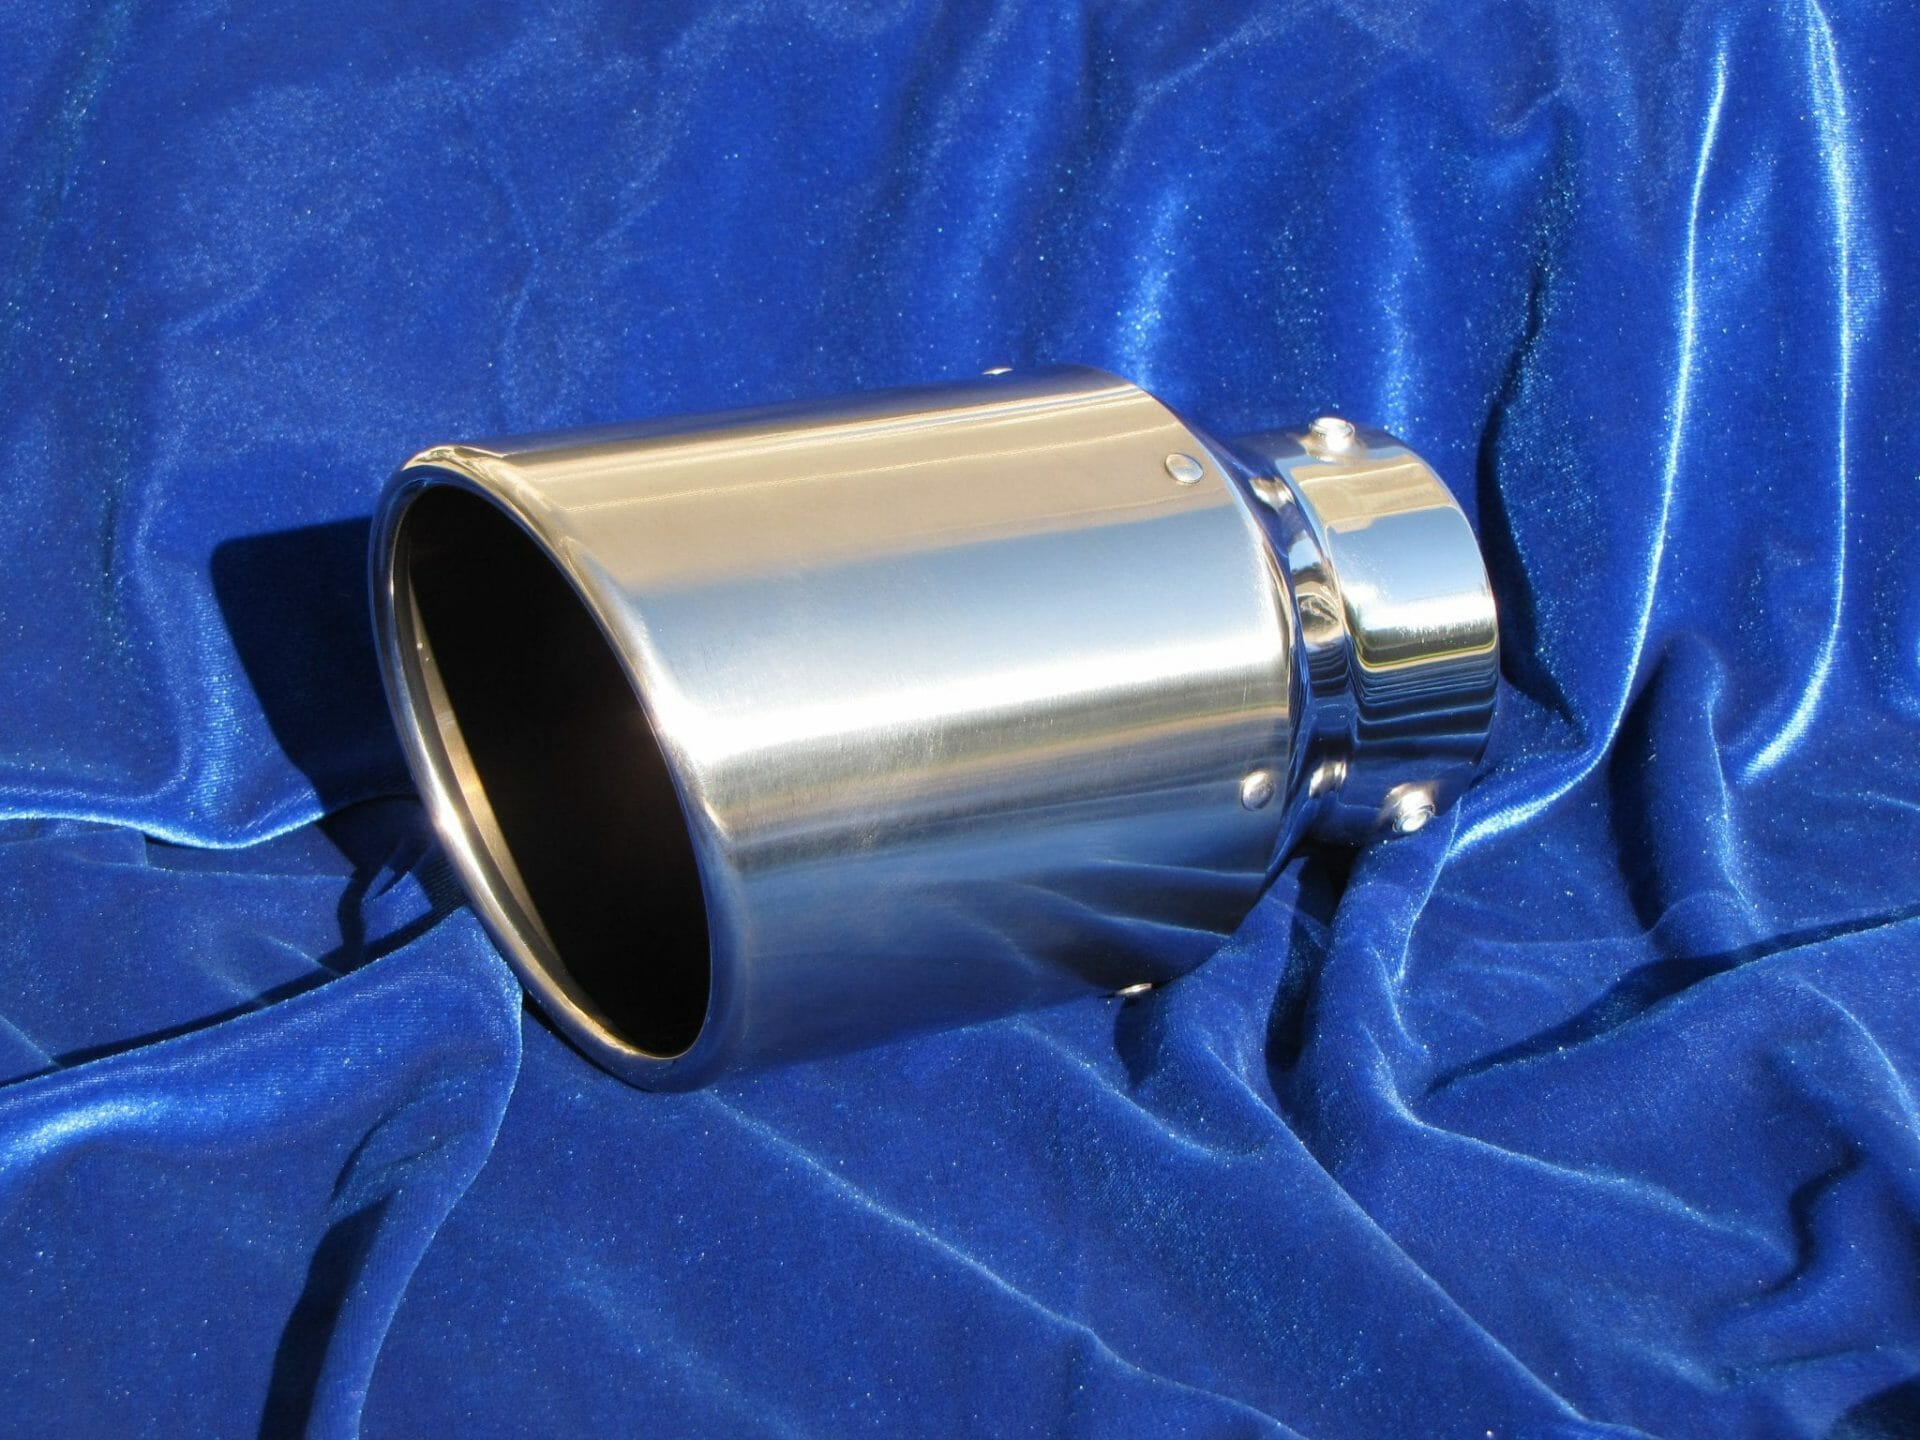 Motordyne Stainless Rolled Exhaust Tip